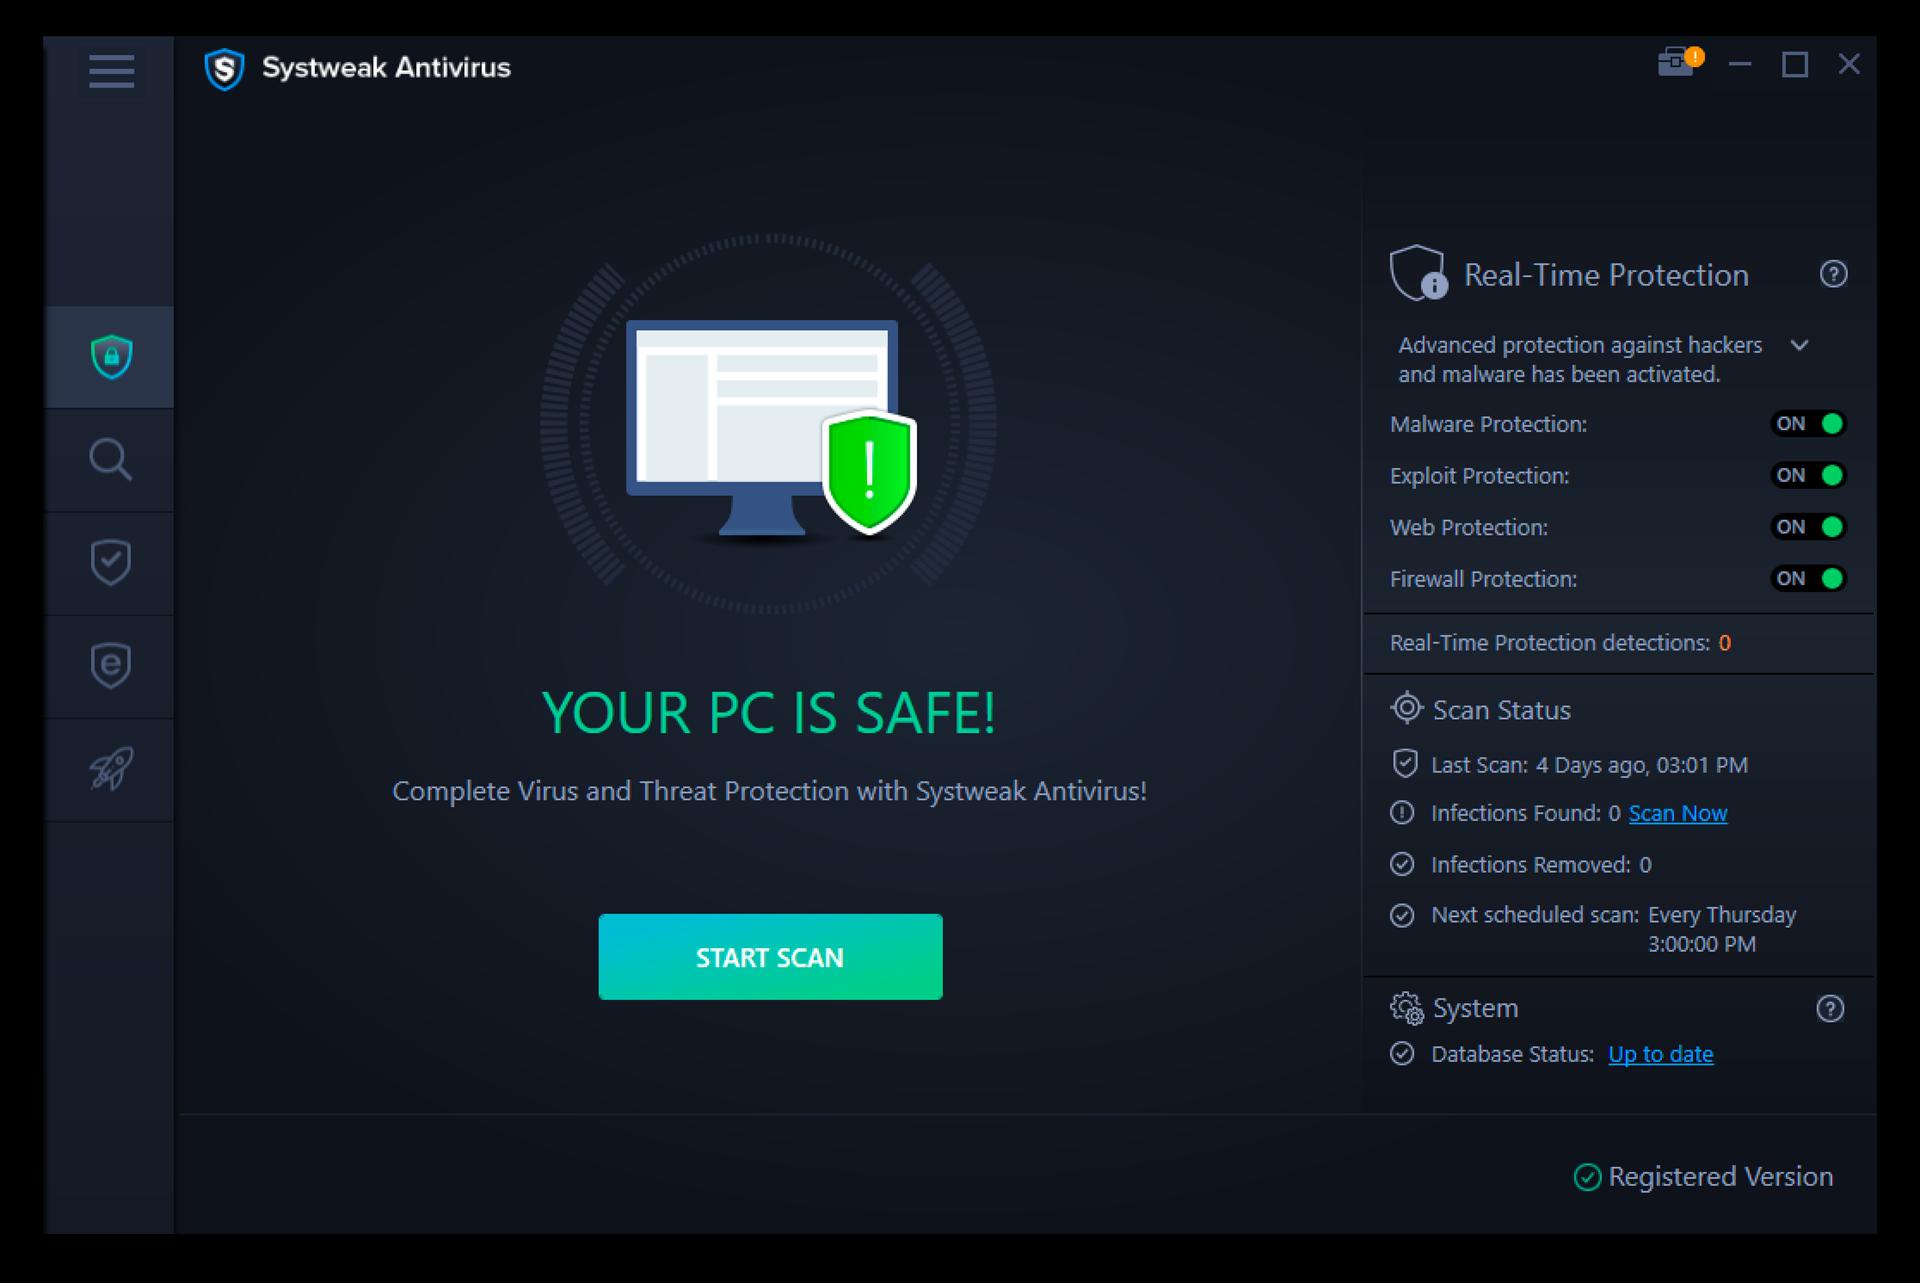 Systweak Antivirus Screenshot